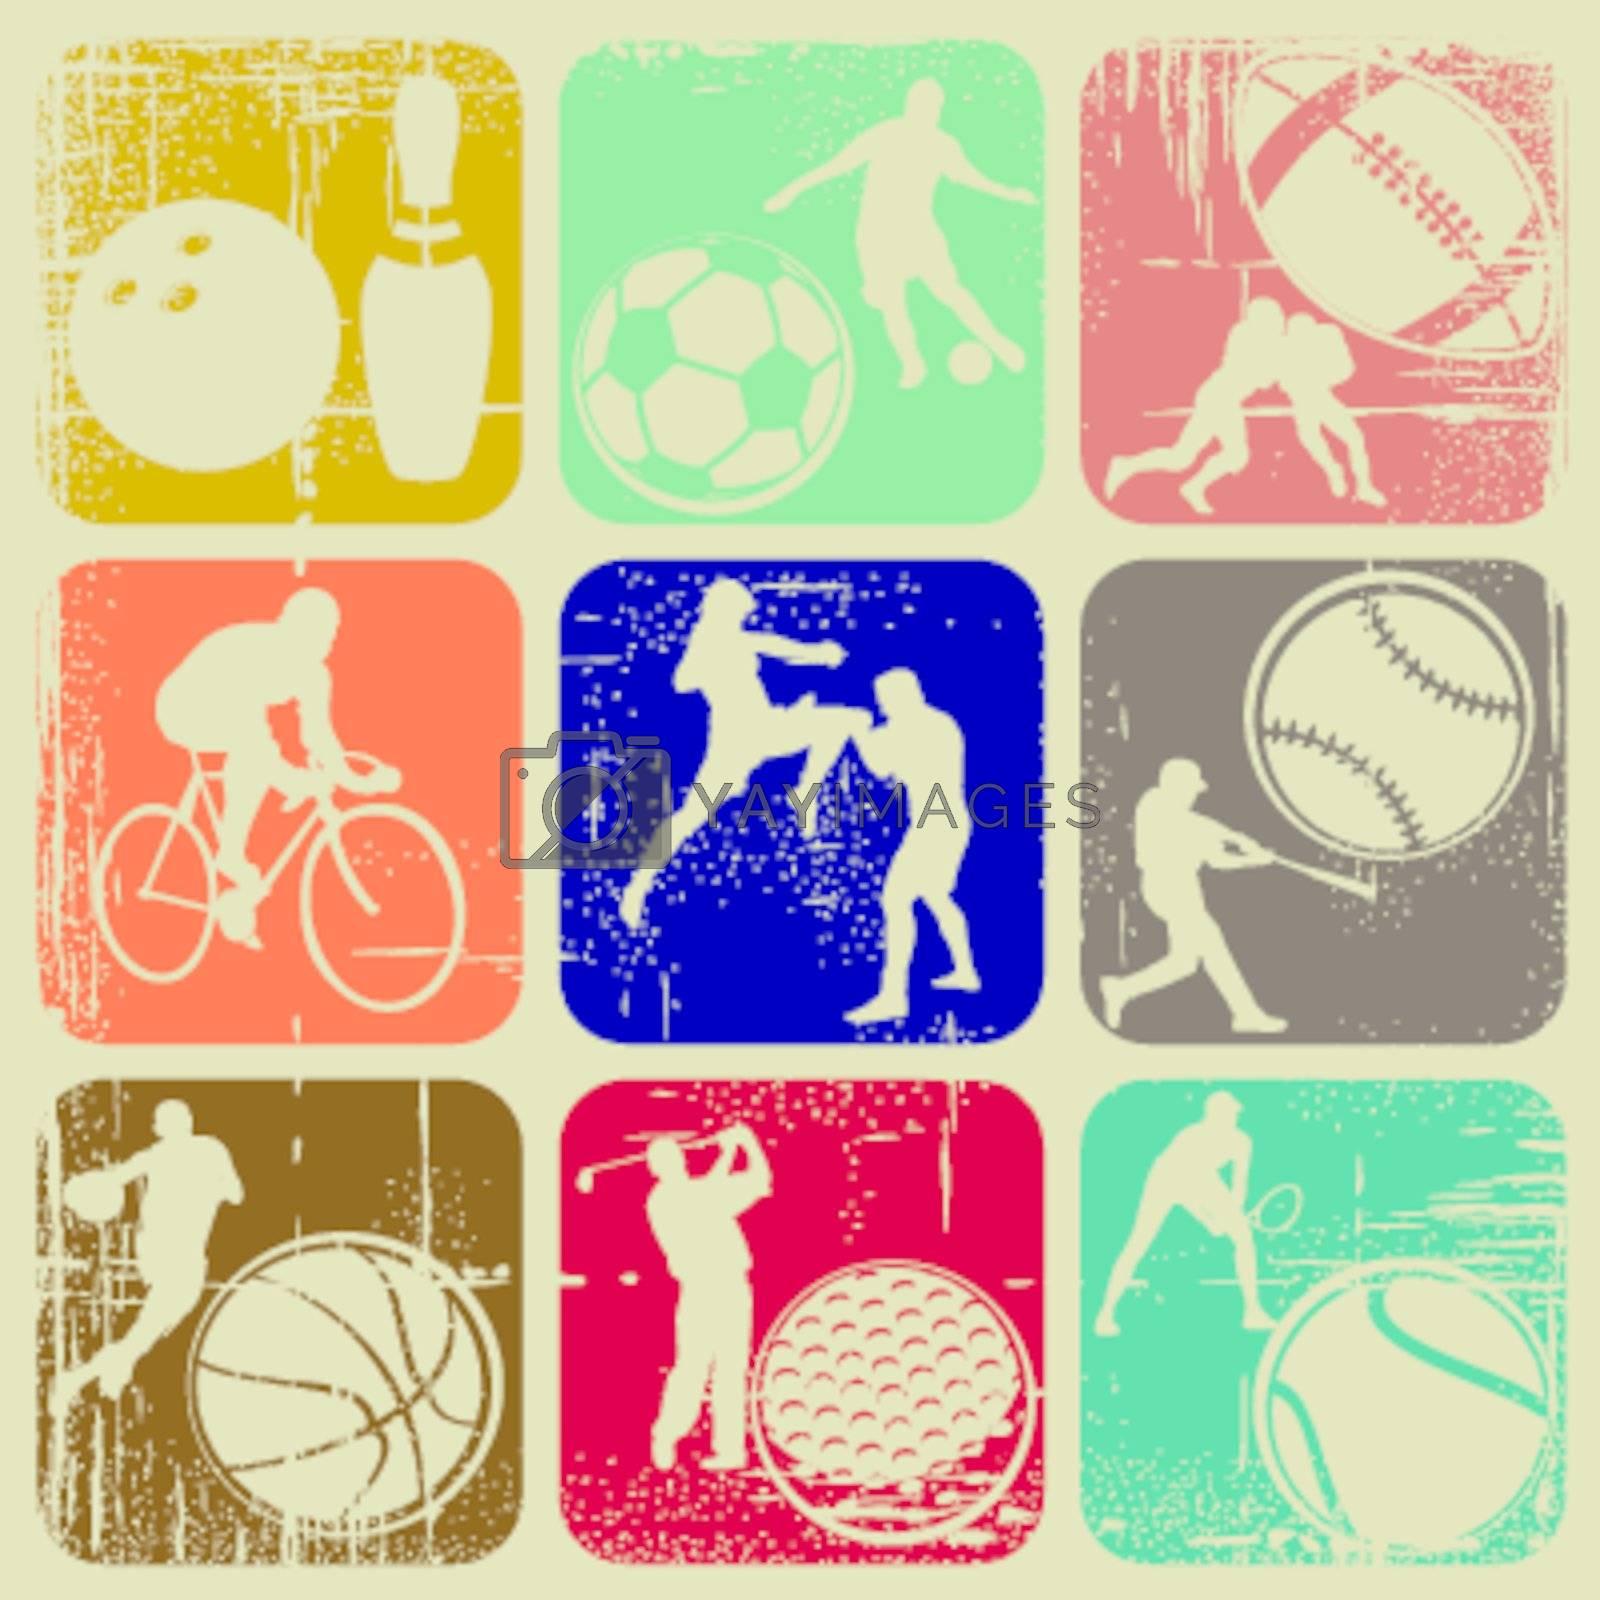 illustration set of sports banners on grunge background